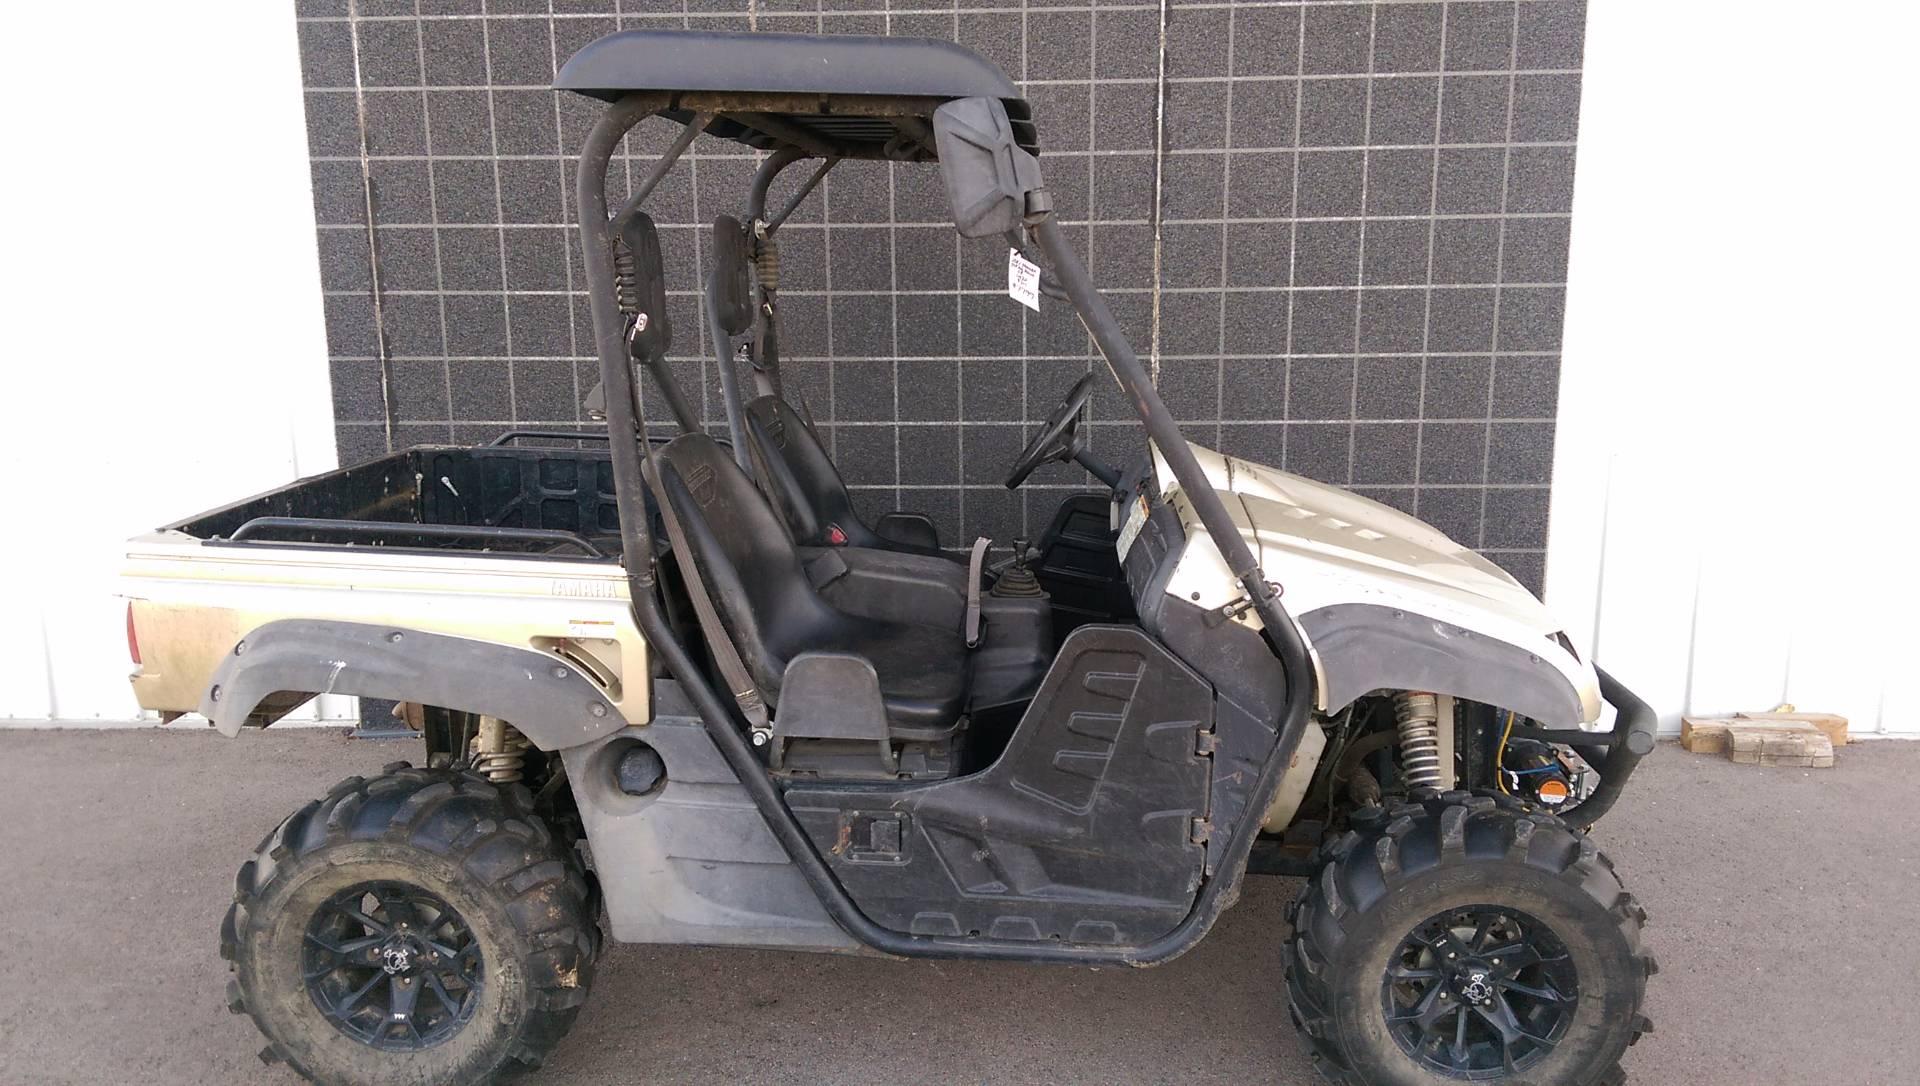 2012 yamaha rhino 700 fi auto 4x4 sport edition for sale for Yamaha rapid city sd